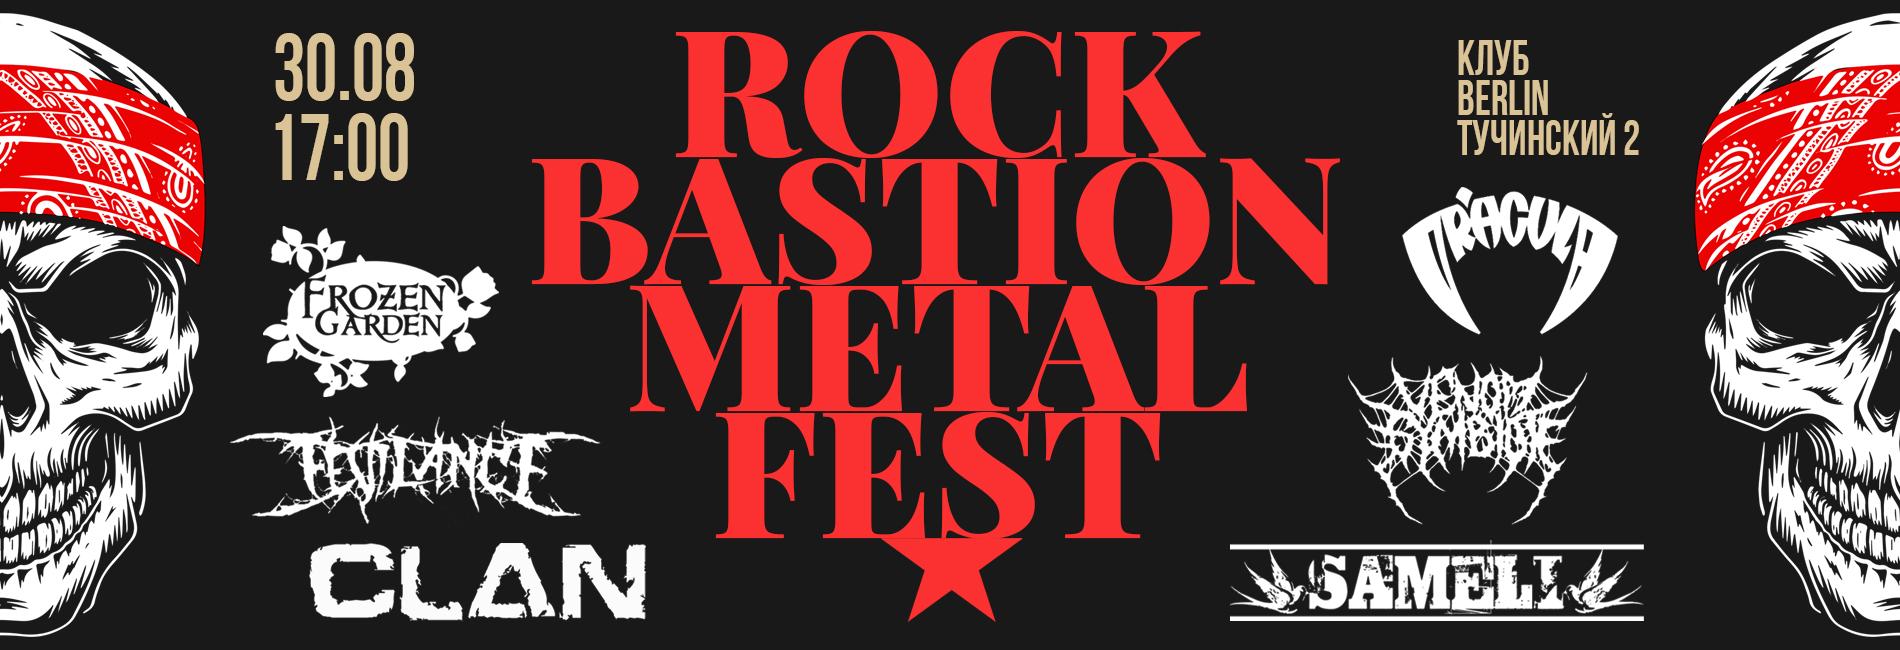 Rock Bastion Metal Fest 30 августа 2020 Бар «Doodah King» Минск